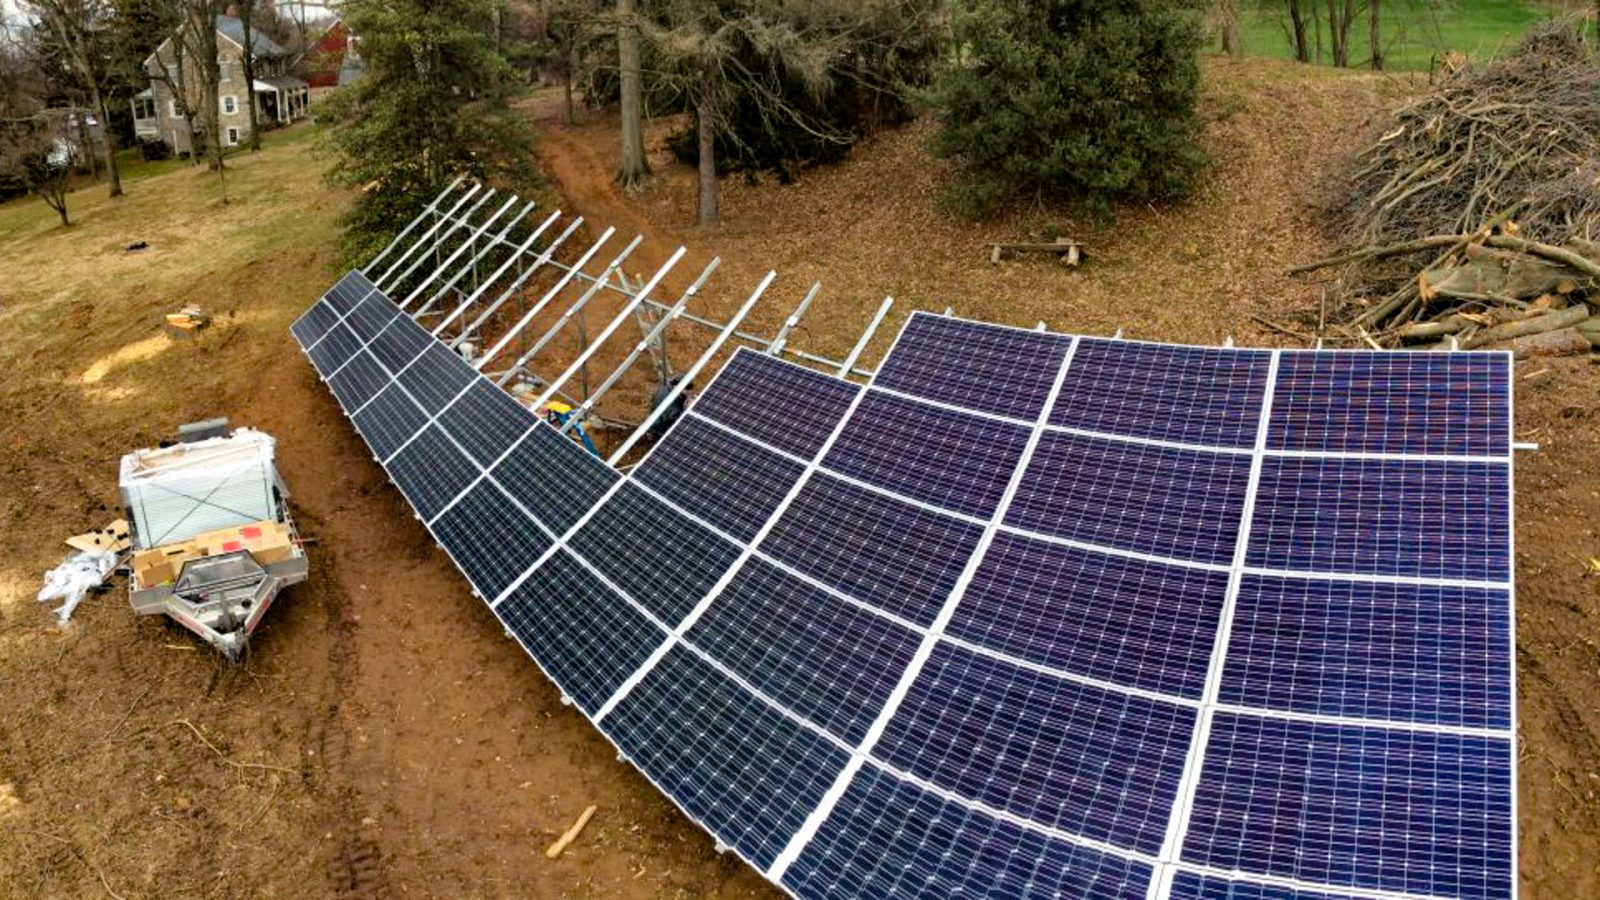 A 17 kw solar installation for a net zero building in Willow Street, Pennsylvania.